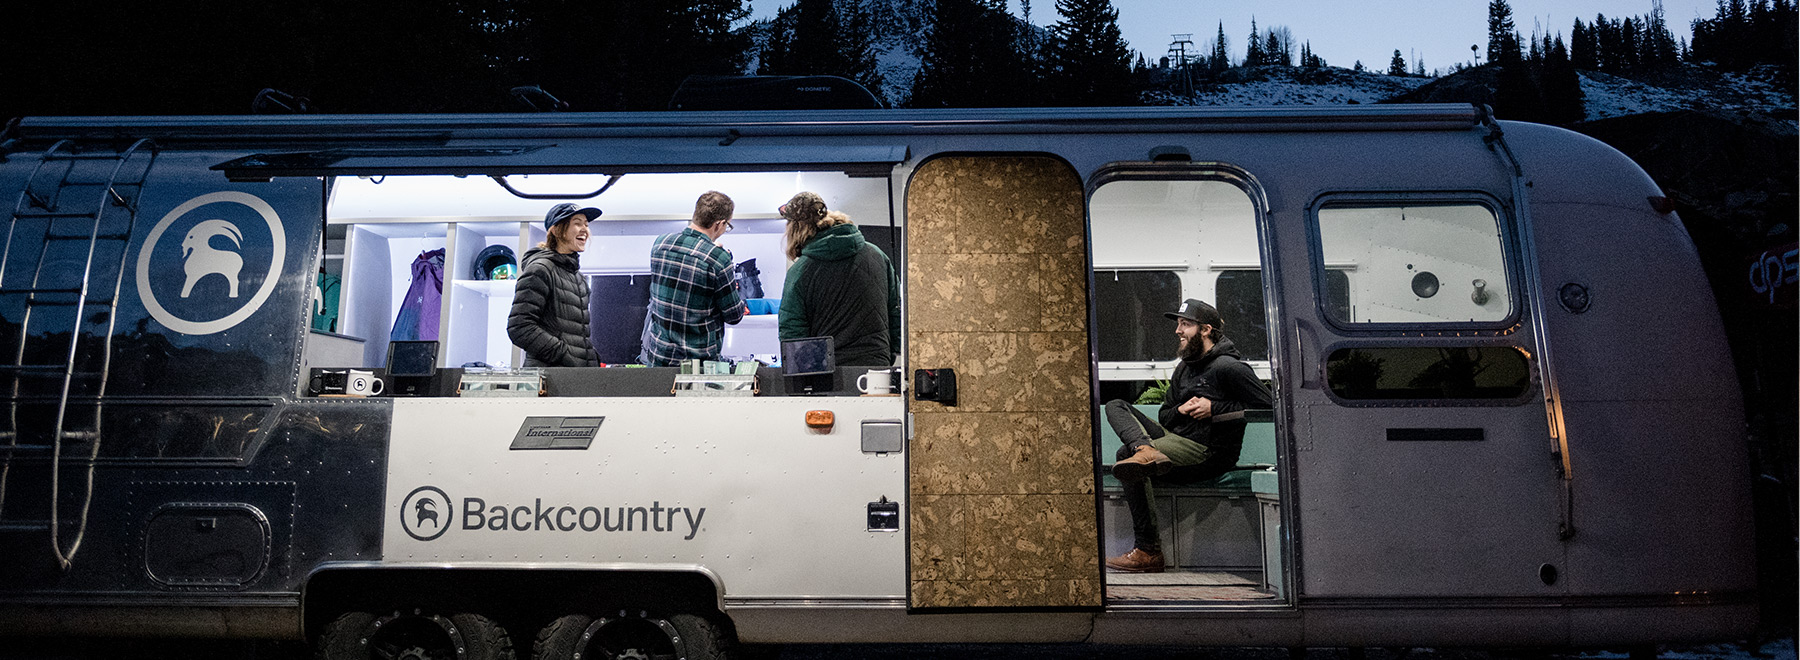 Gearheads | Backcountry com